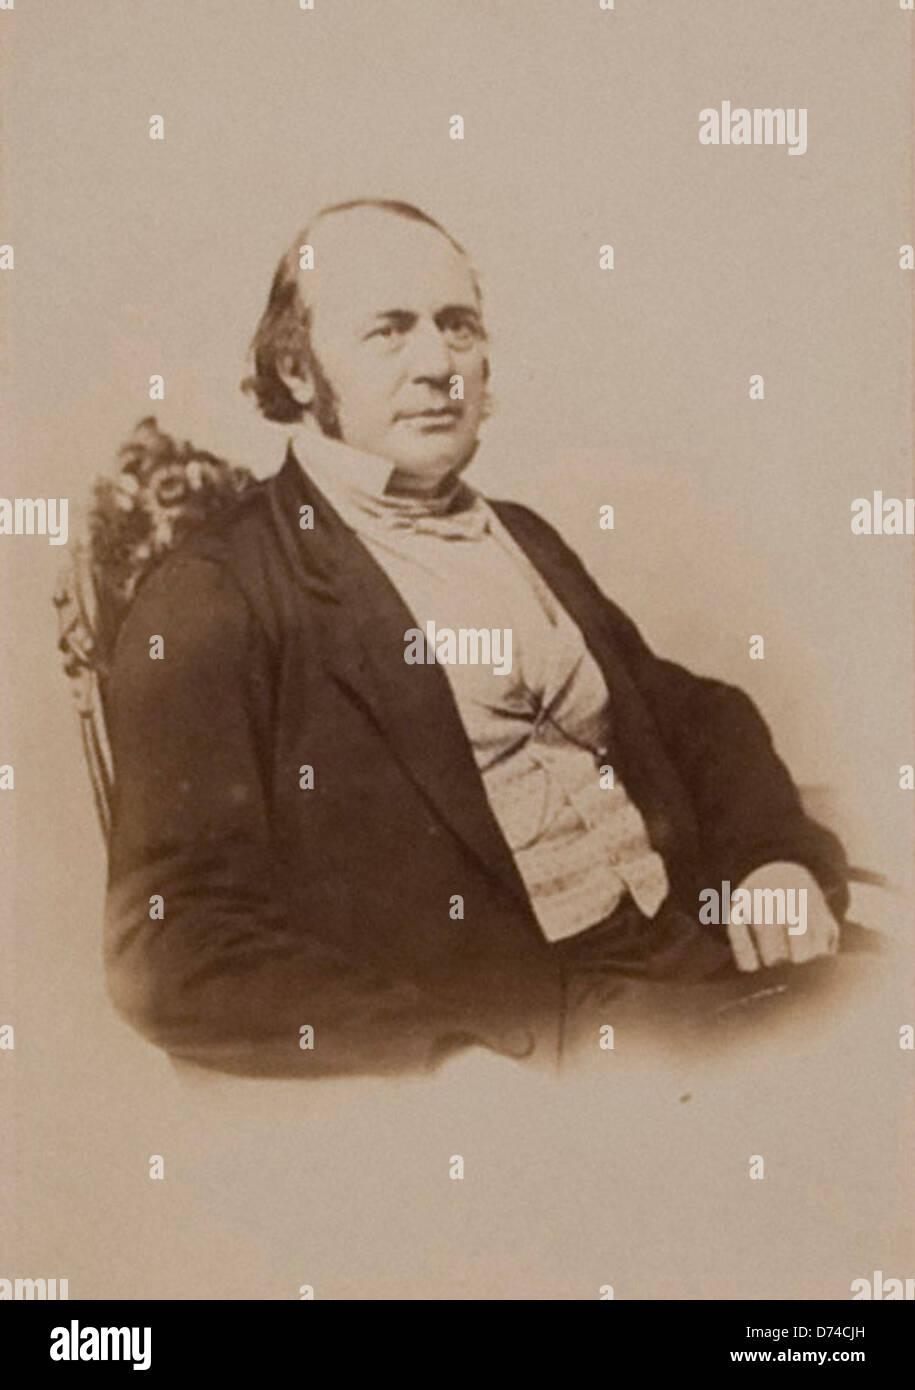 Louis Agassiz 1807 1973 Swiss Born American Naturalist